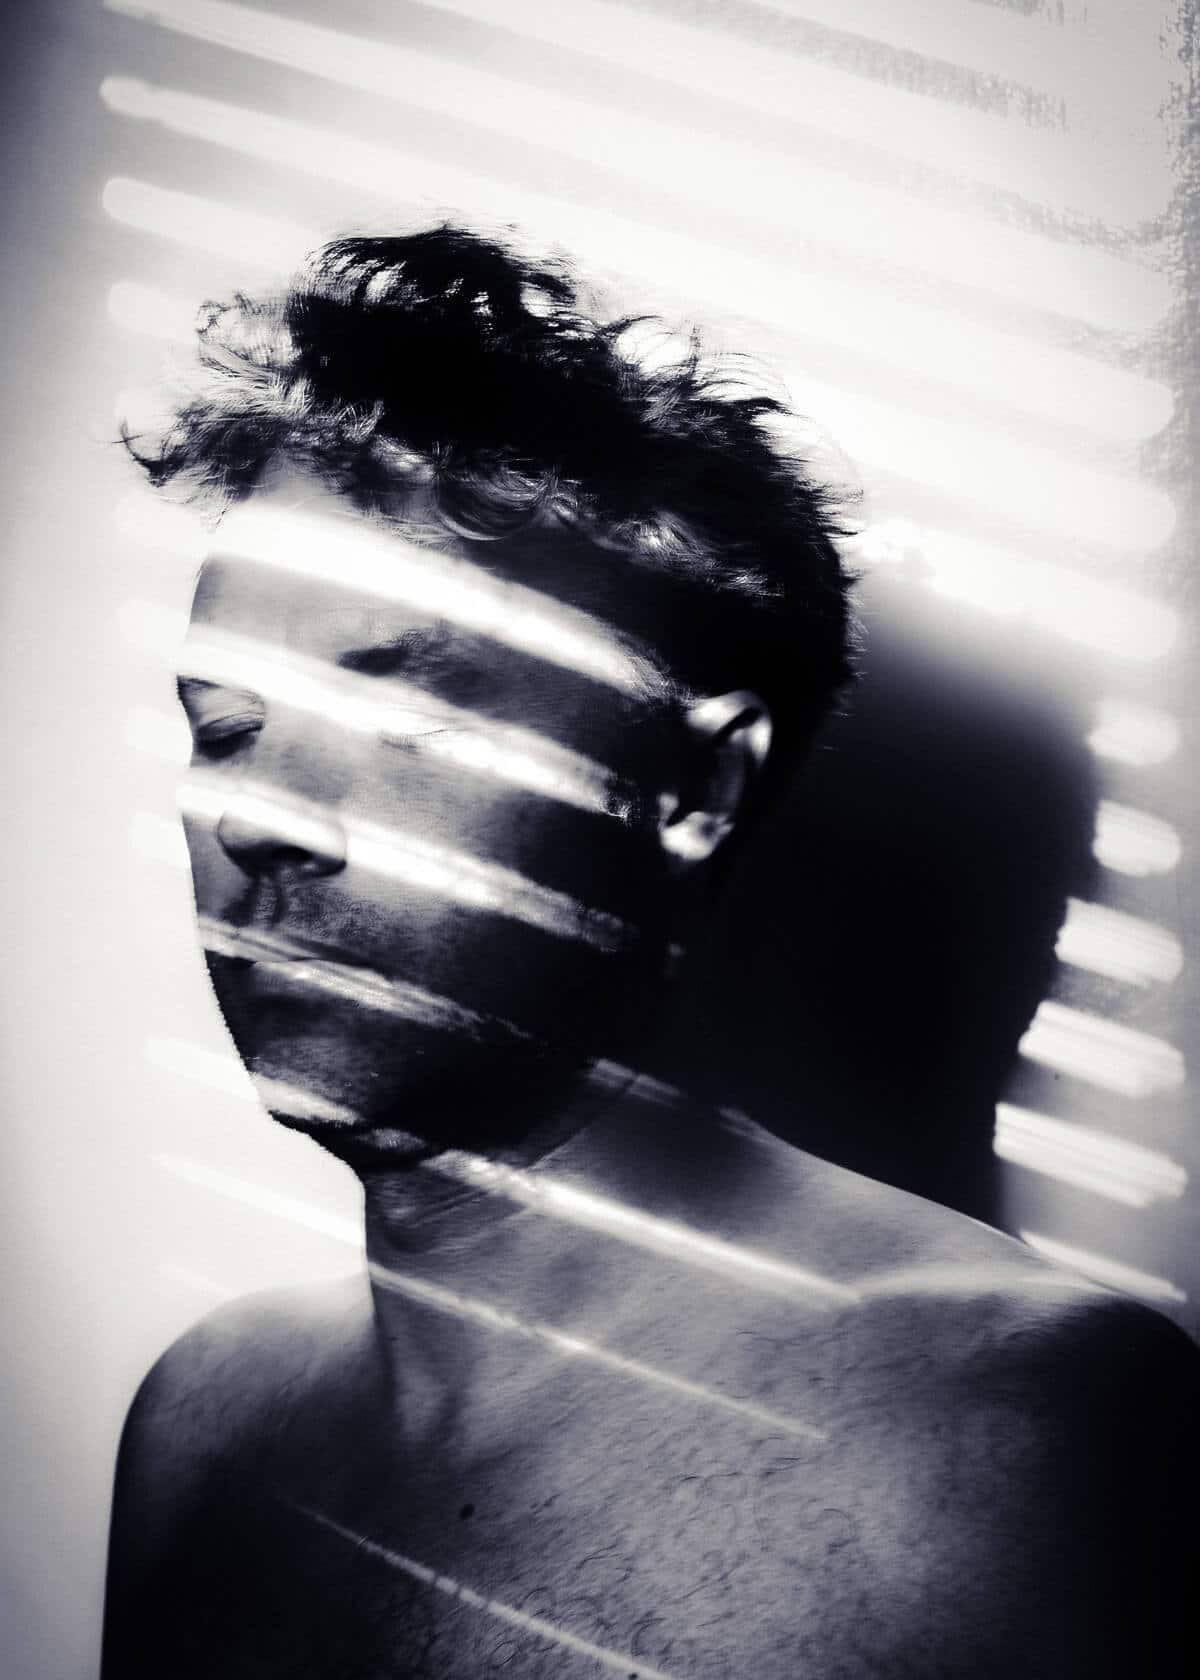 Monochrome self portrait with white light bars across my face